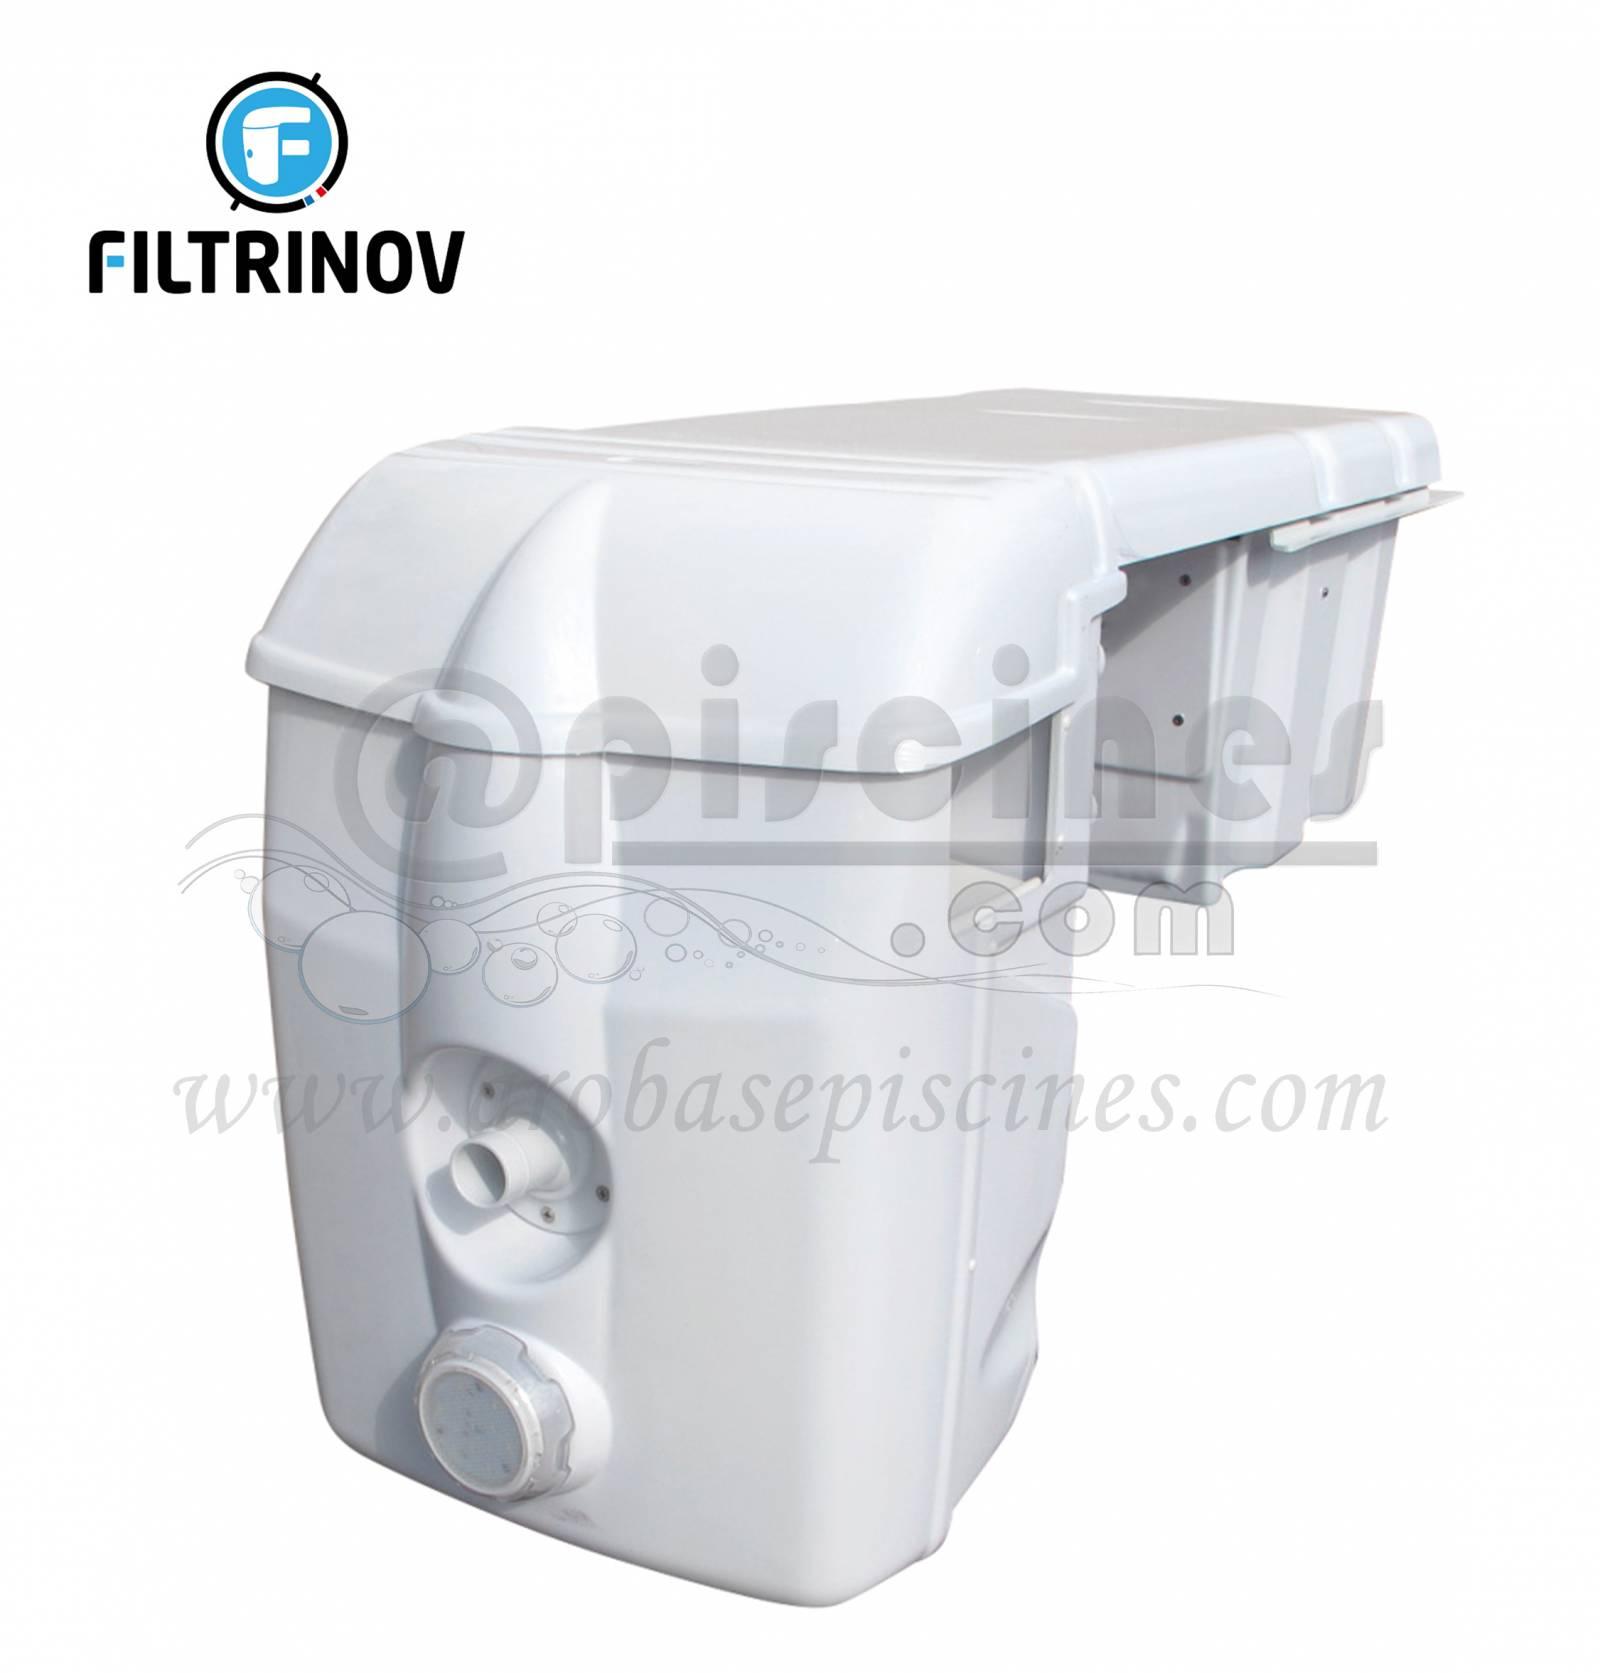 Bloc filtrant filtrinov mx 18 standard piscine en ligne for Bloc filtrant piscine